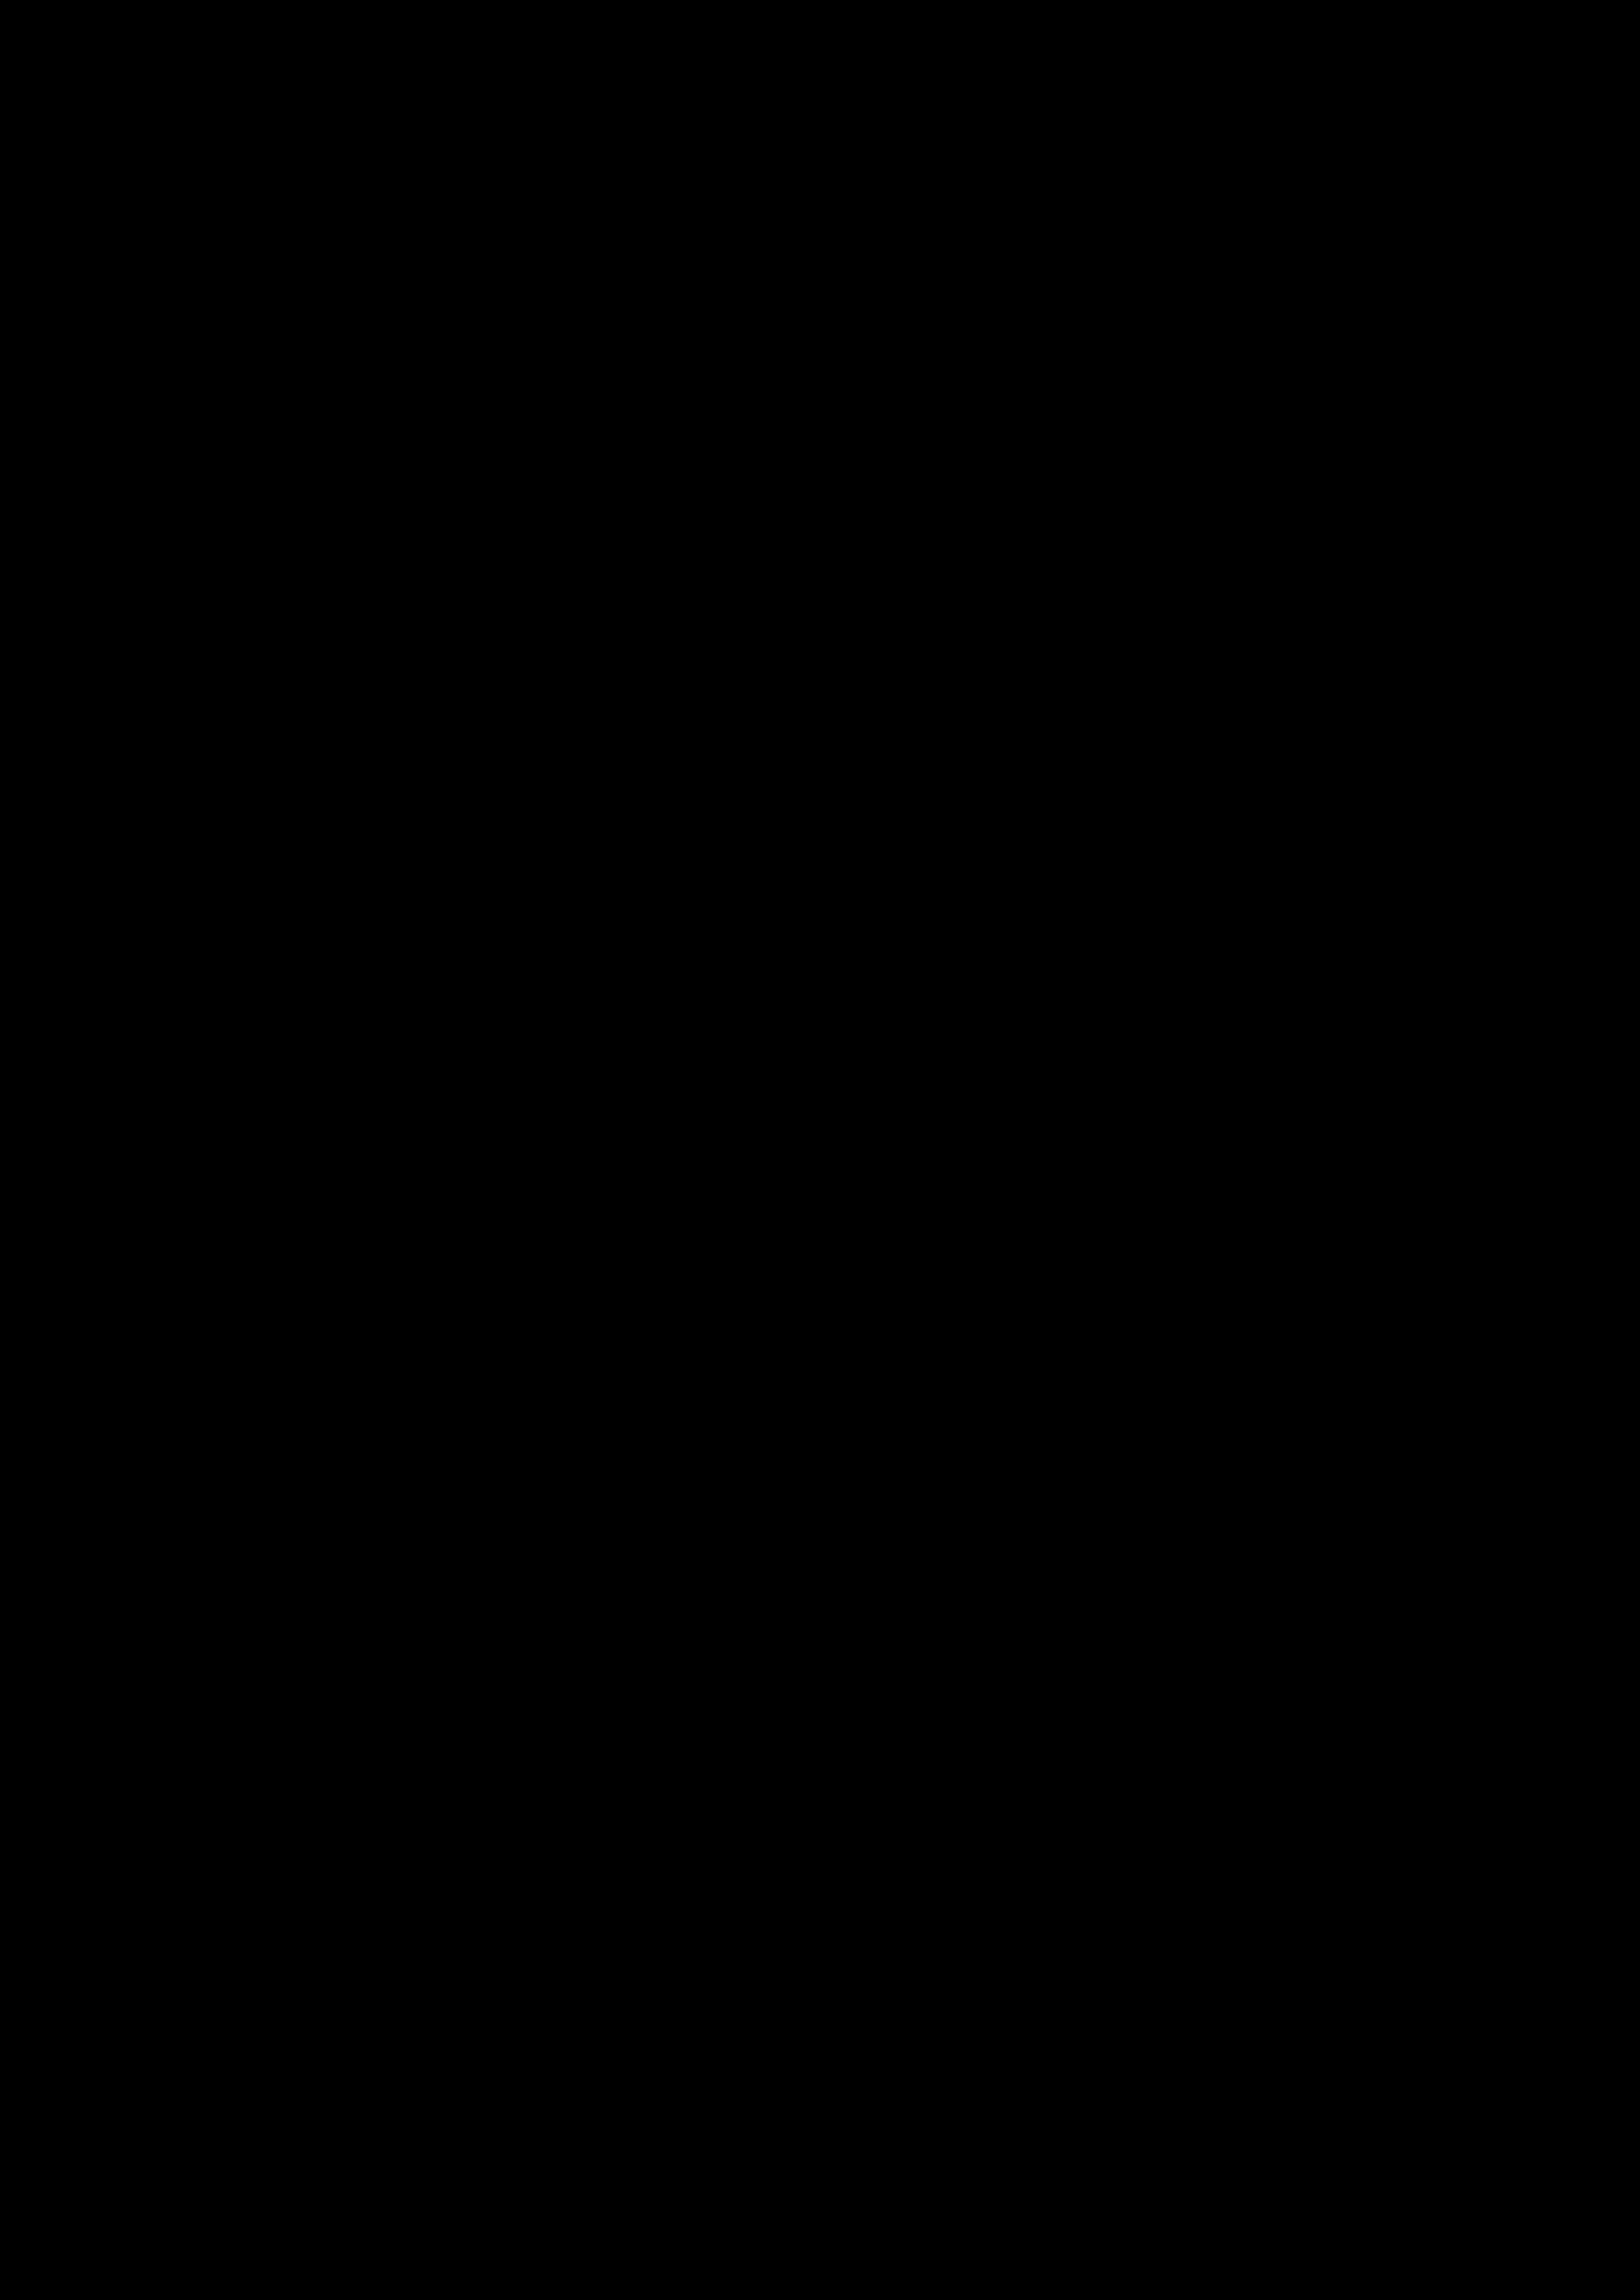 Beetle stencil pattern big. Longhorn clipart svg